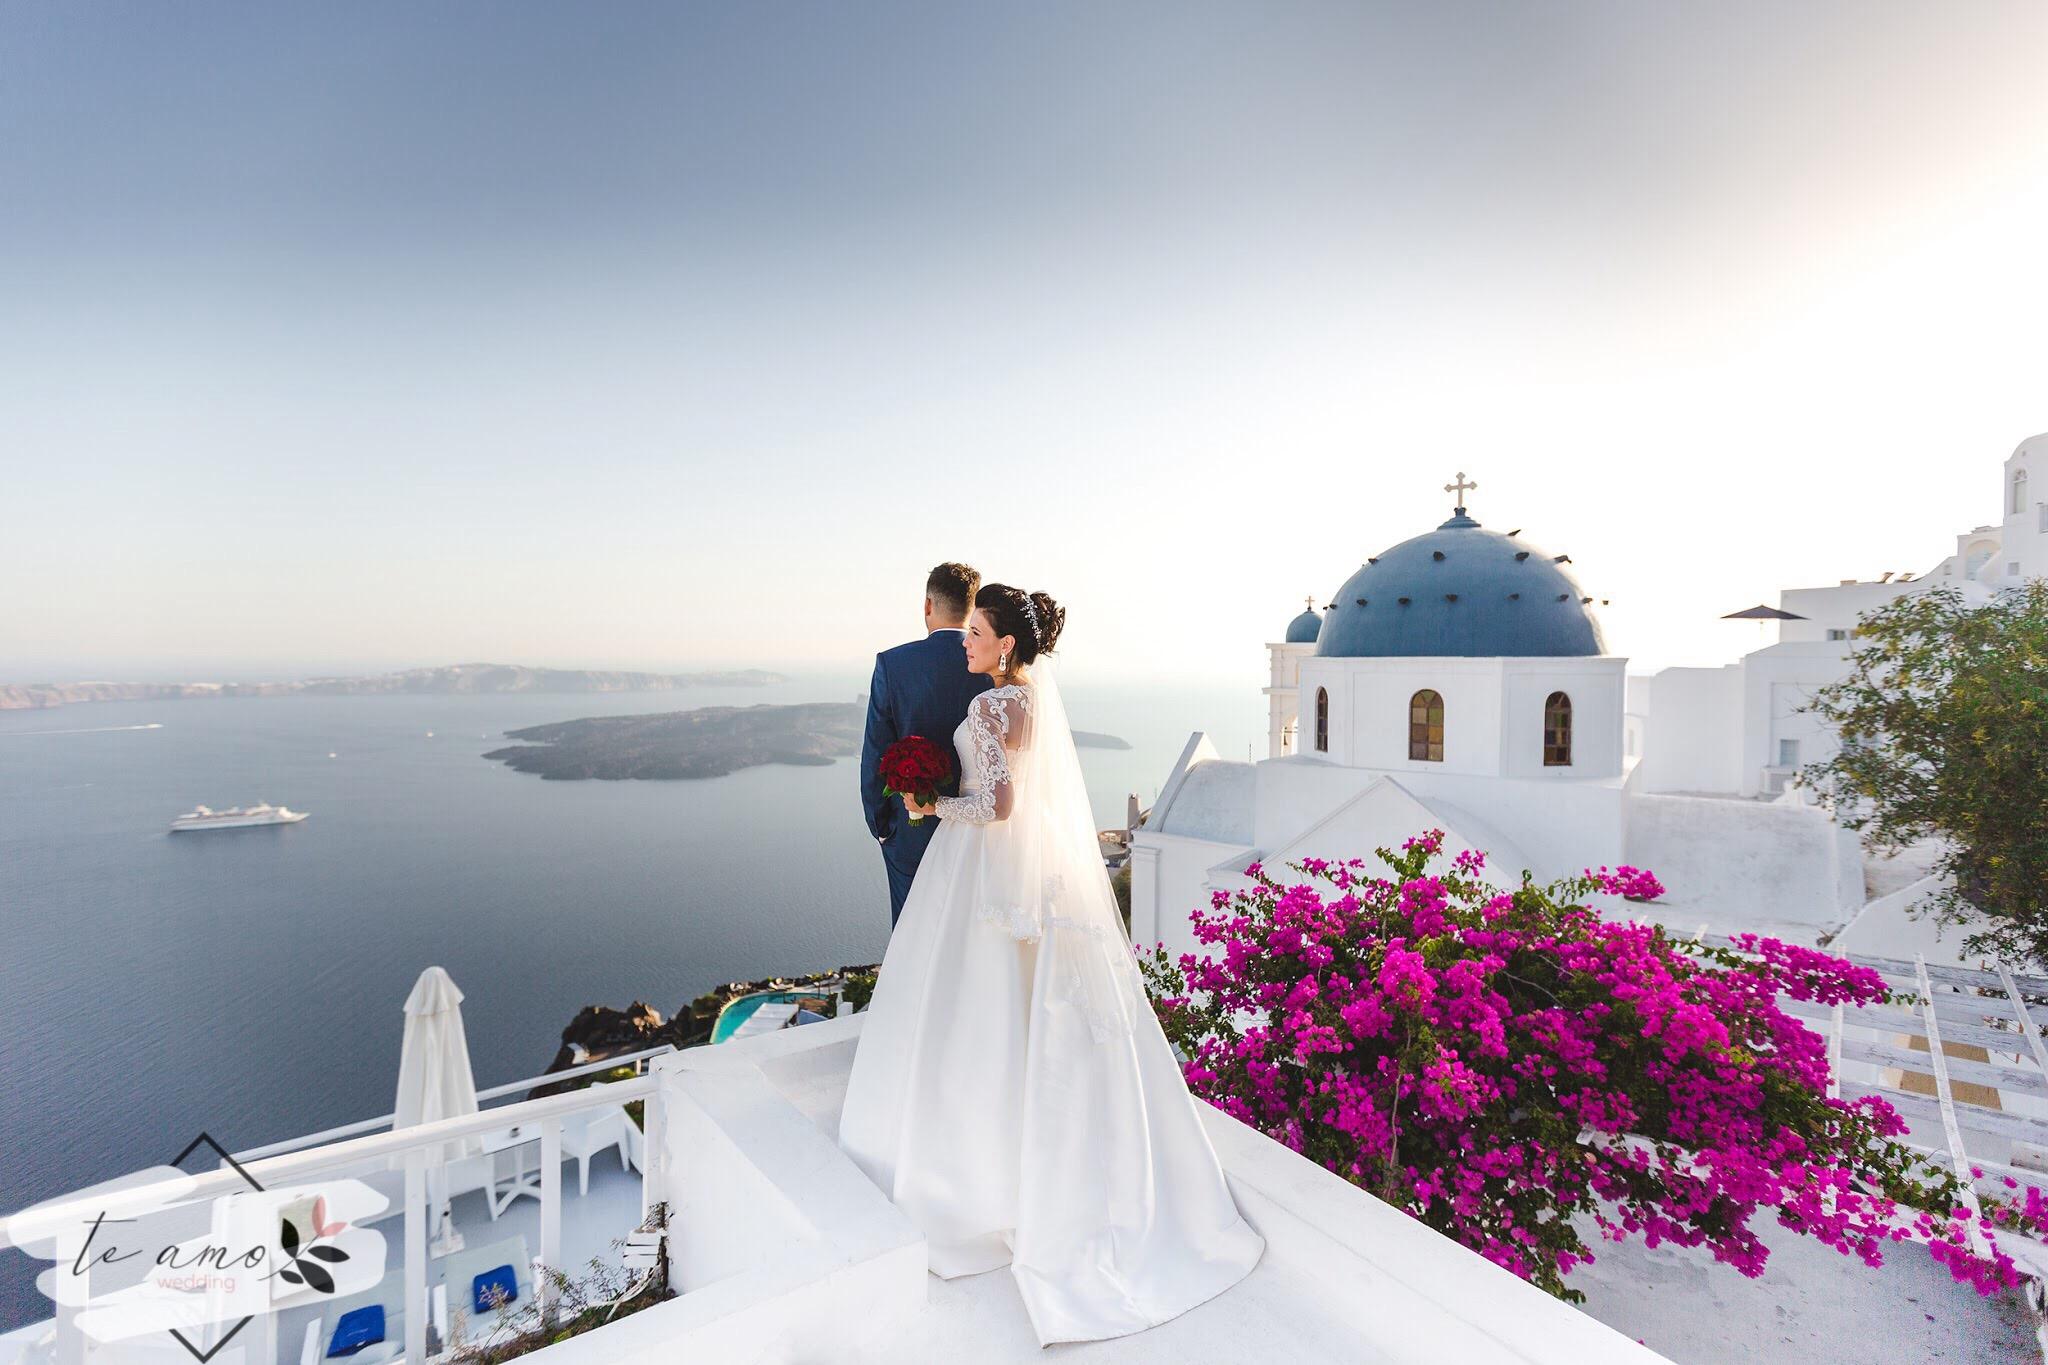 T&M  | Te Amo Wedding